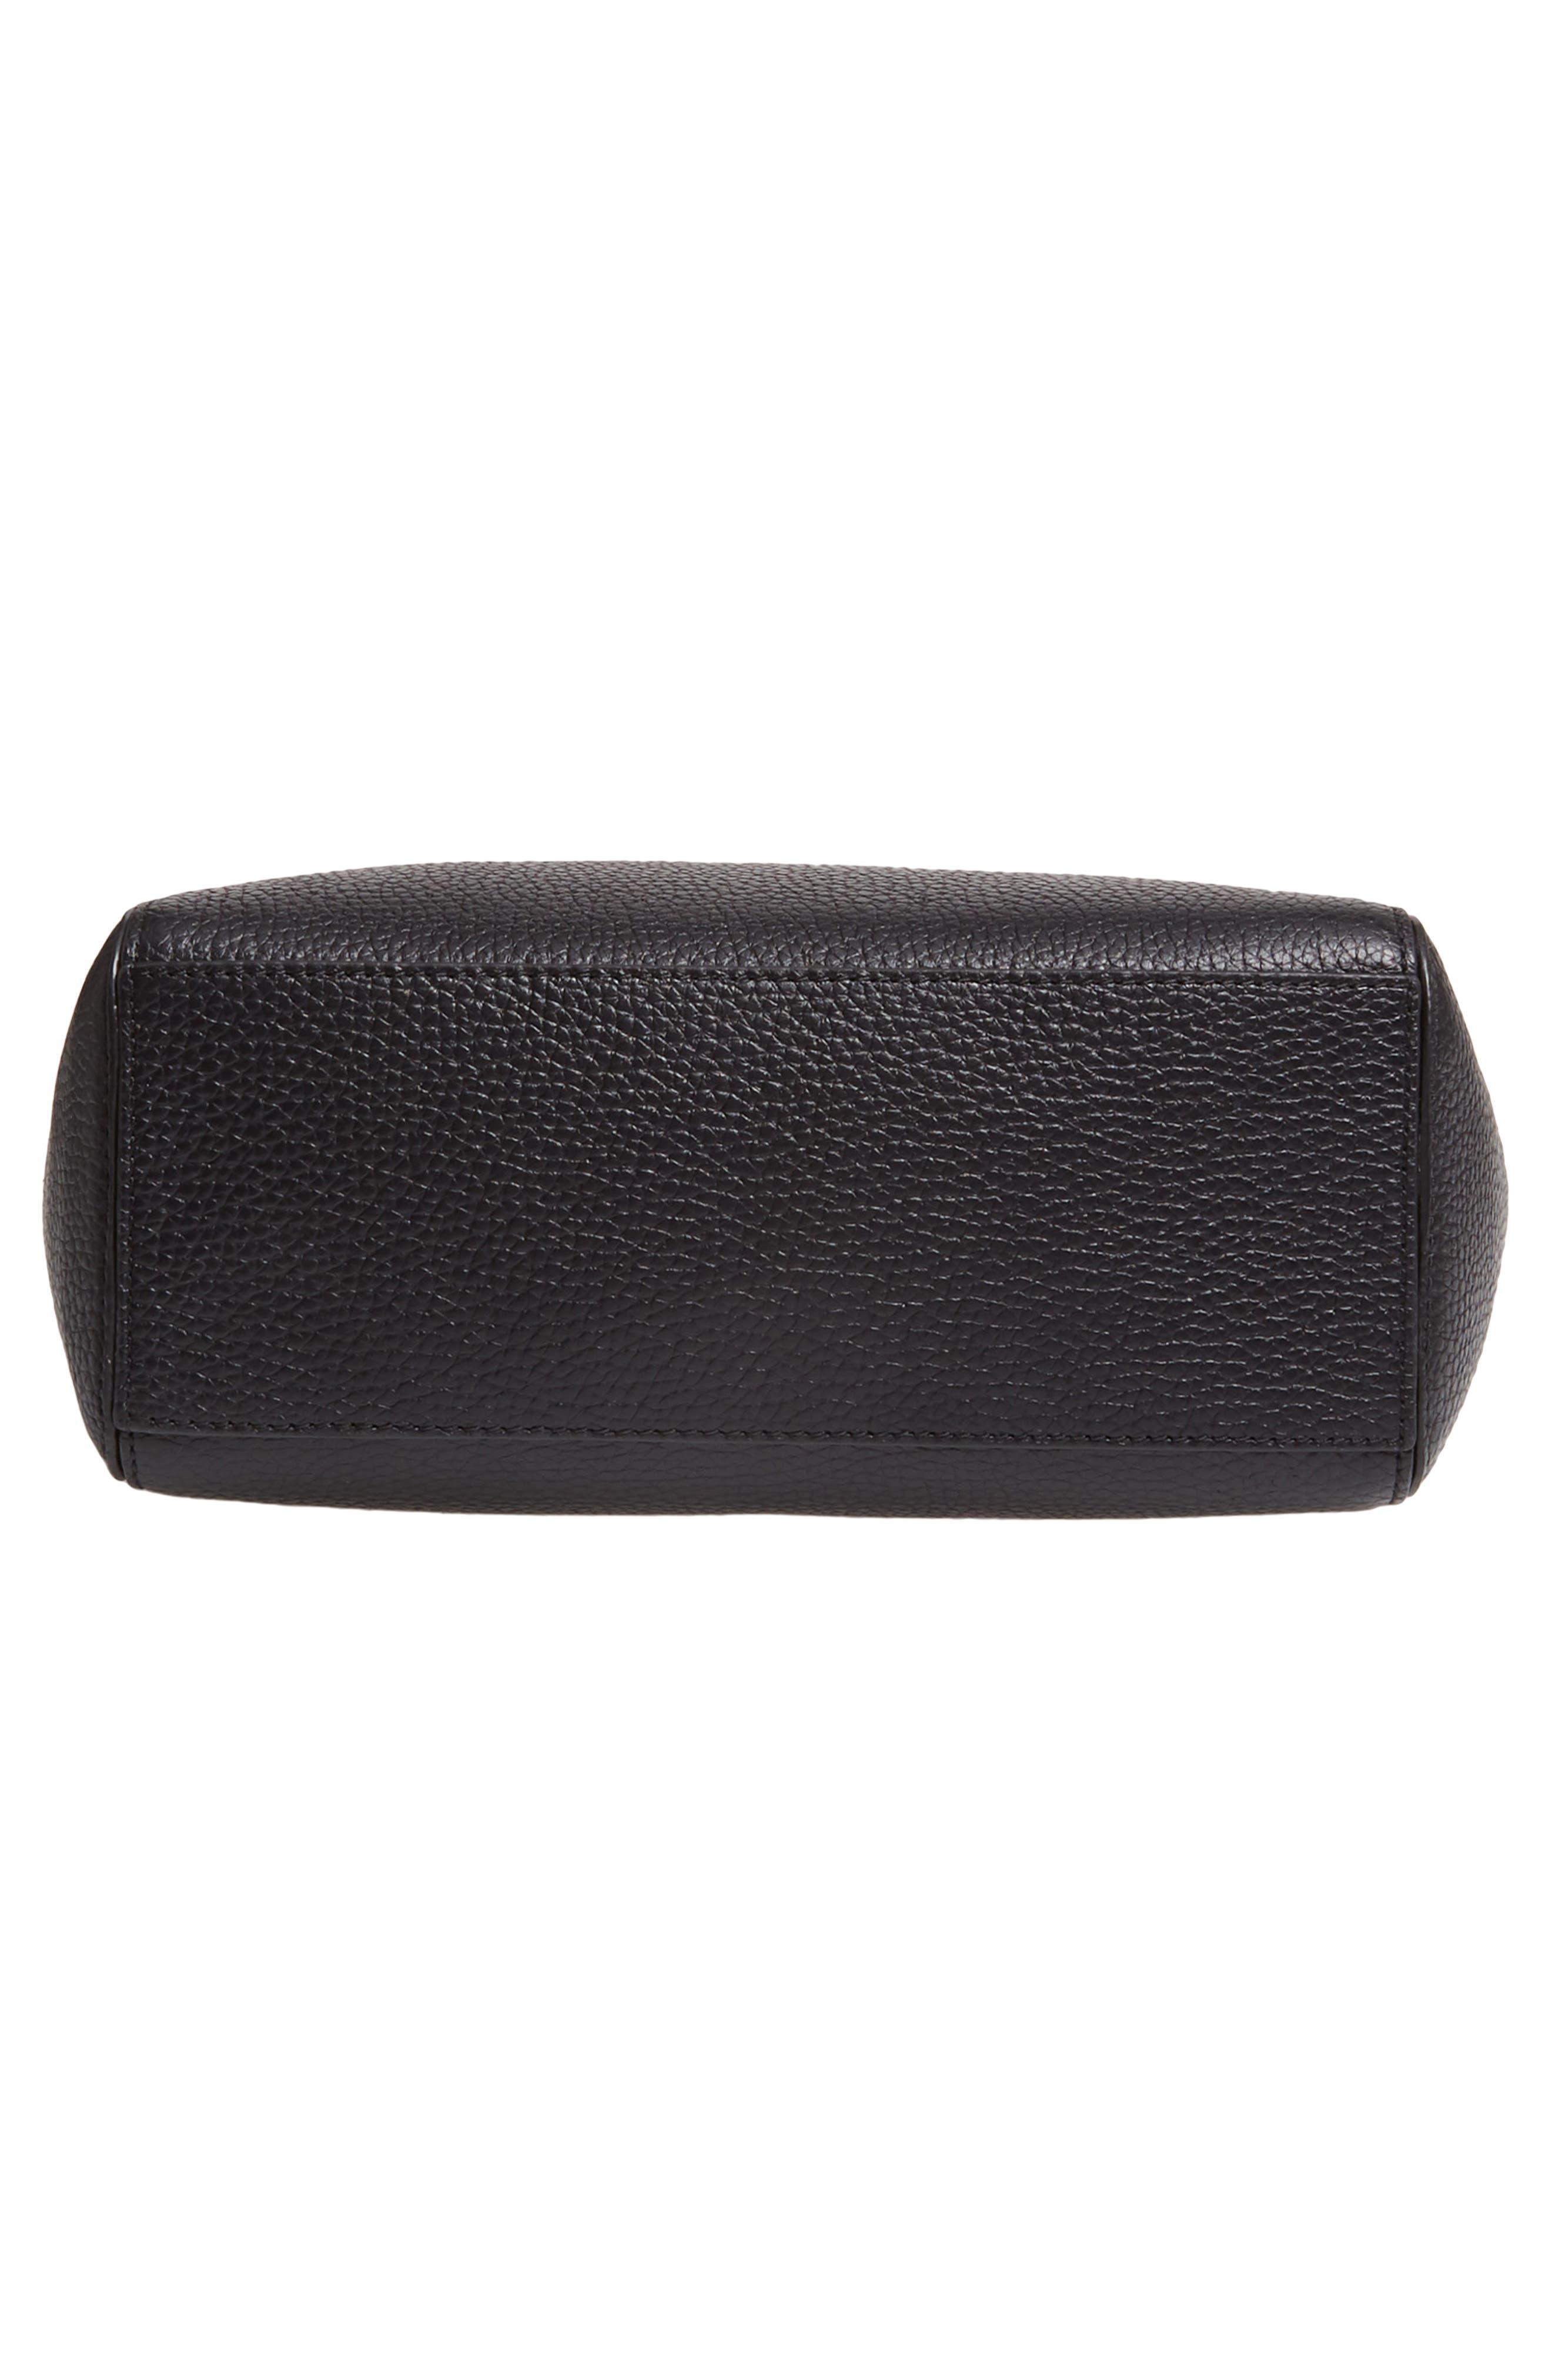 TREASURE & BOND,                             Campbell Leather & Suede Bucket Bag,                             Alternate thumbnail 6, color,                             BLACK